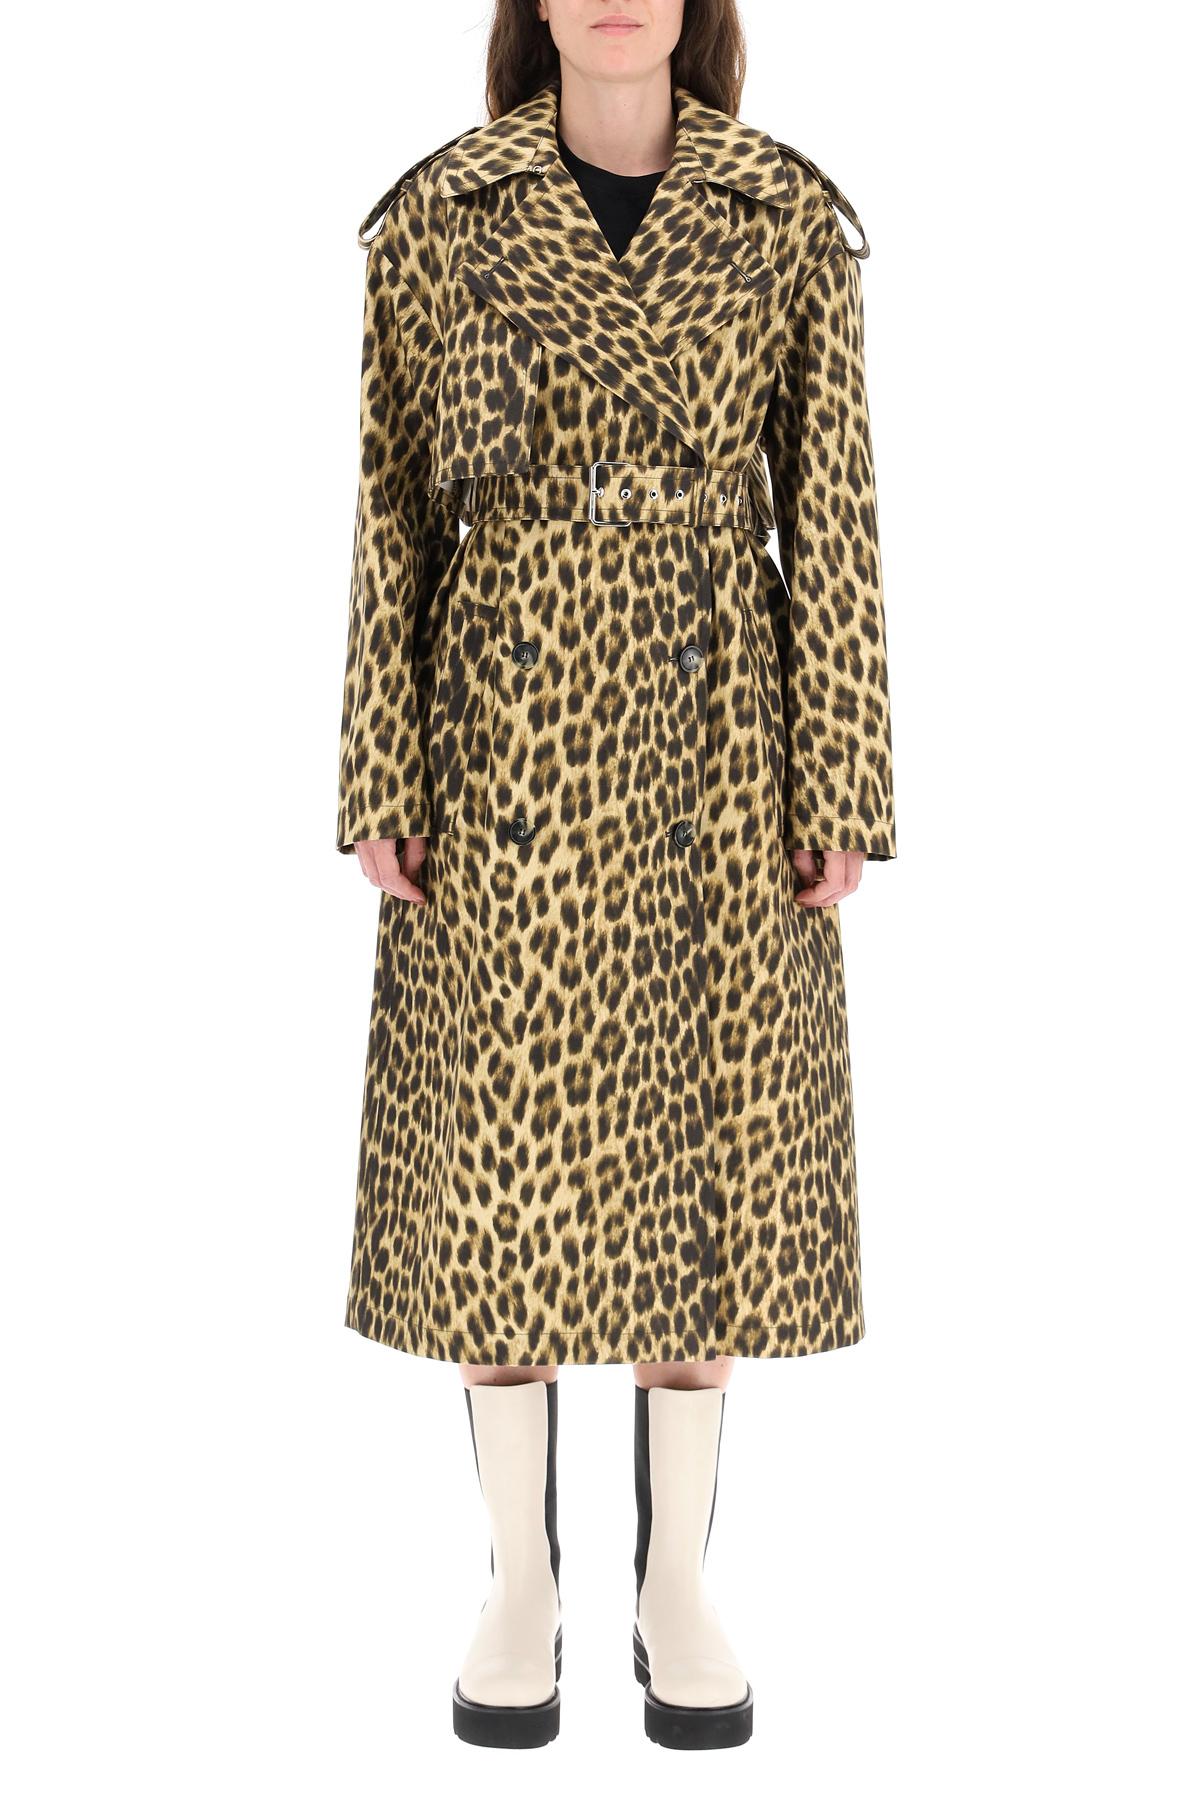 Sportmax raincoat bracco leopardato